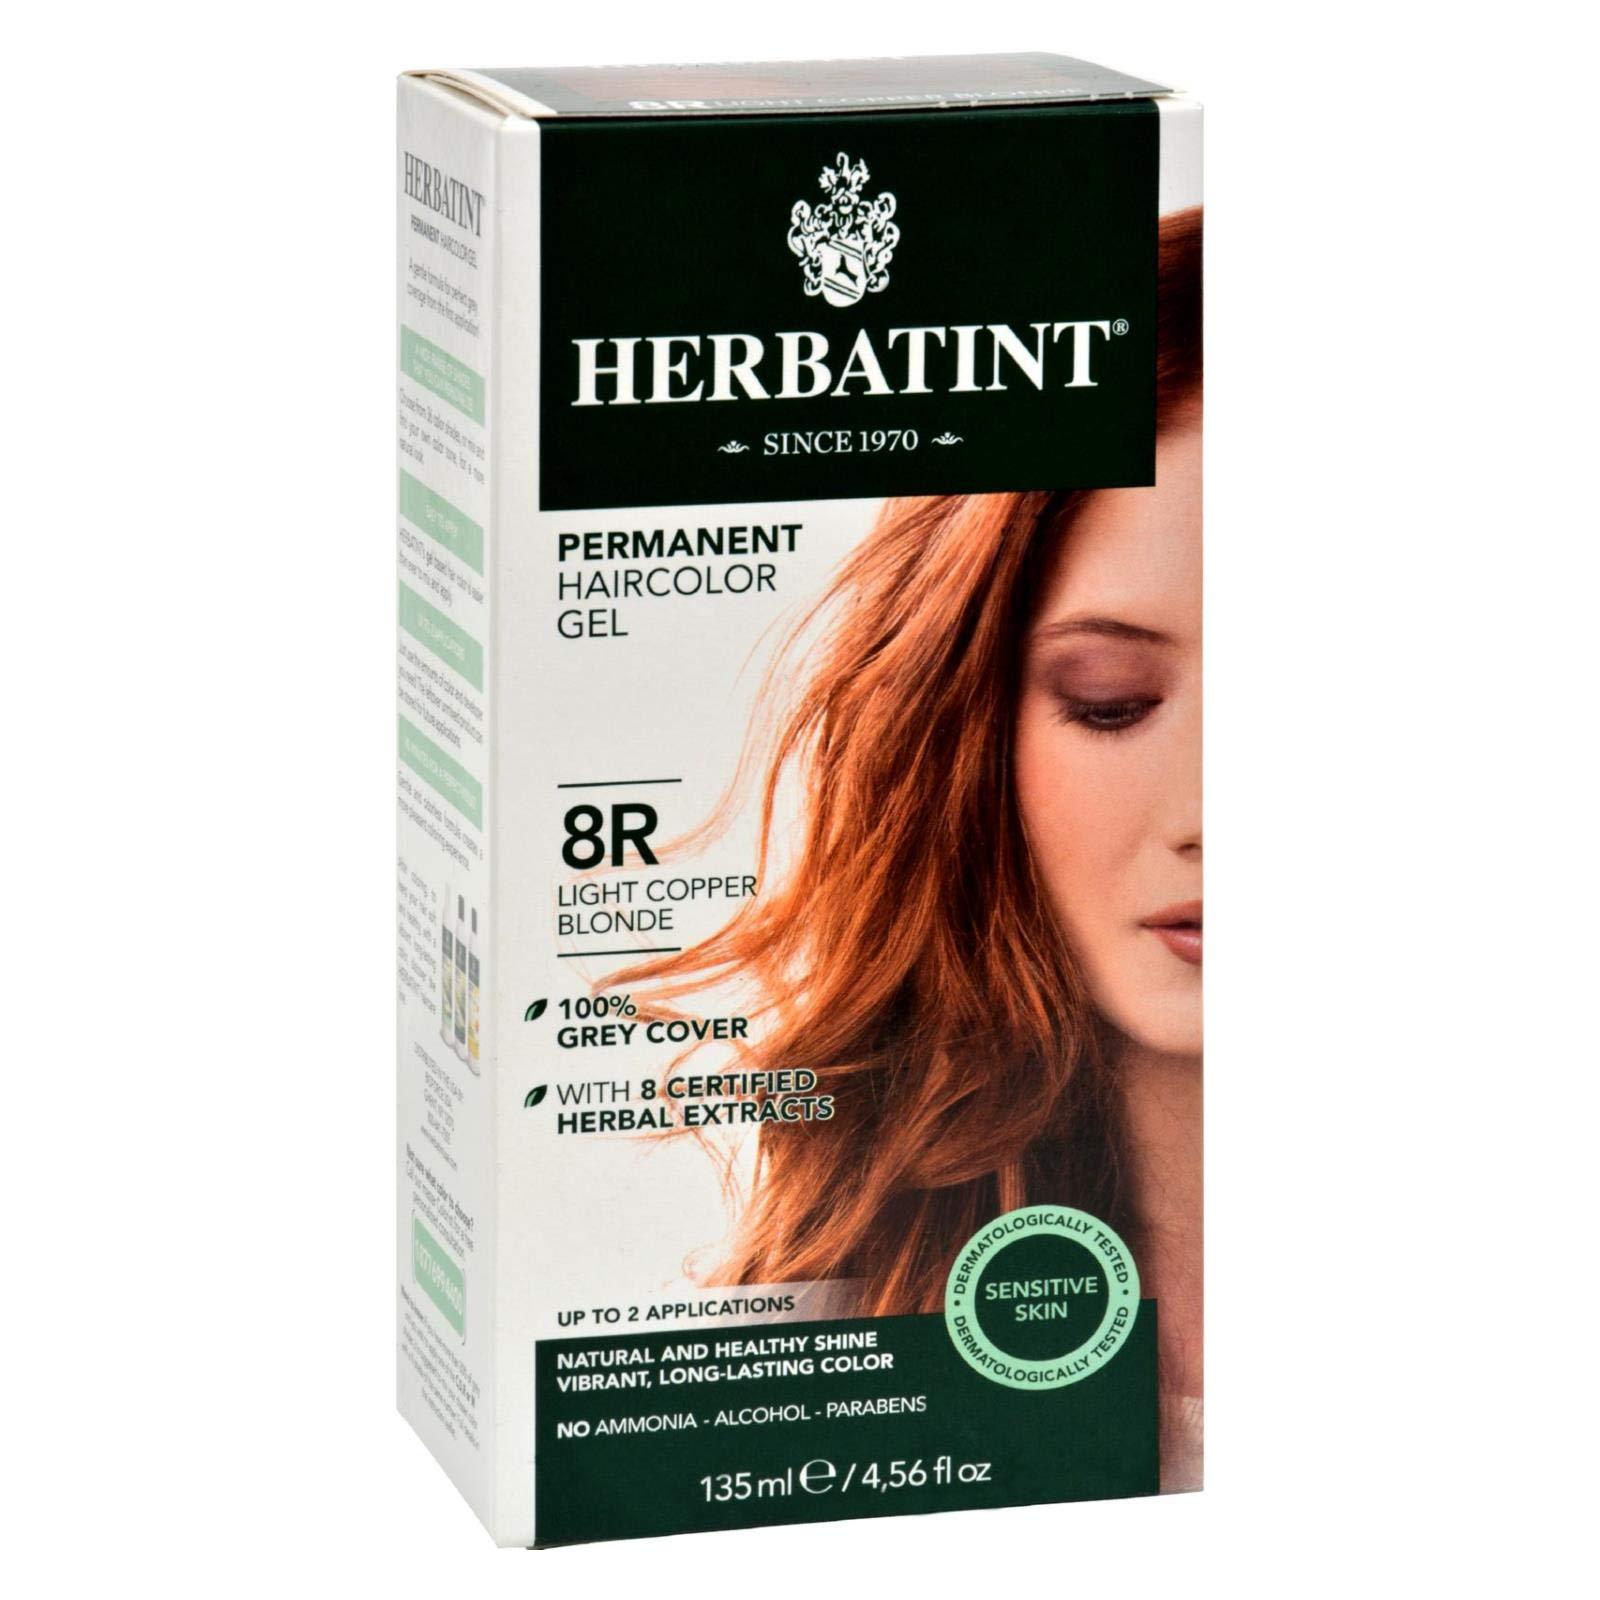 Herbatint 8R Permanent Herbal Copperish Gold Haircolor Gel Kit - 3 per case.